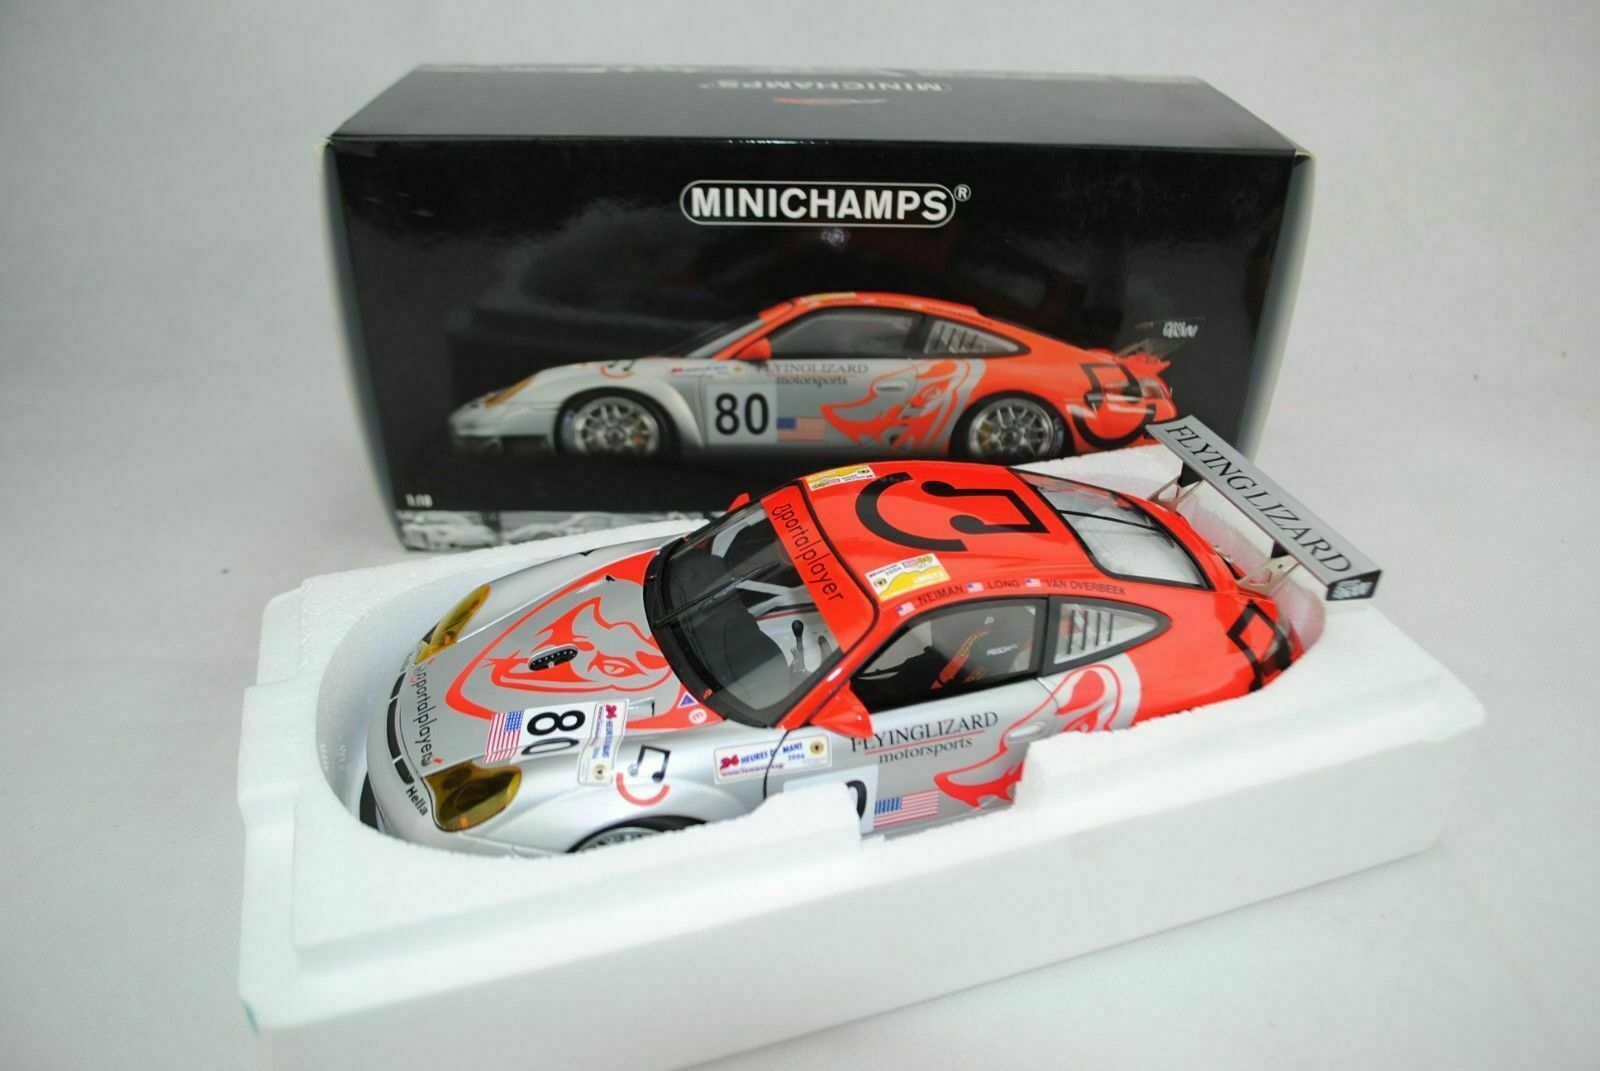 1 18 Minichamps-Porsche 911 gt3 RSR FLYING LIZARD RACING LM 2006  80 Nuovo Scatola Originale